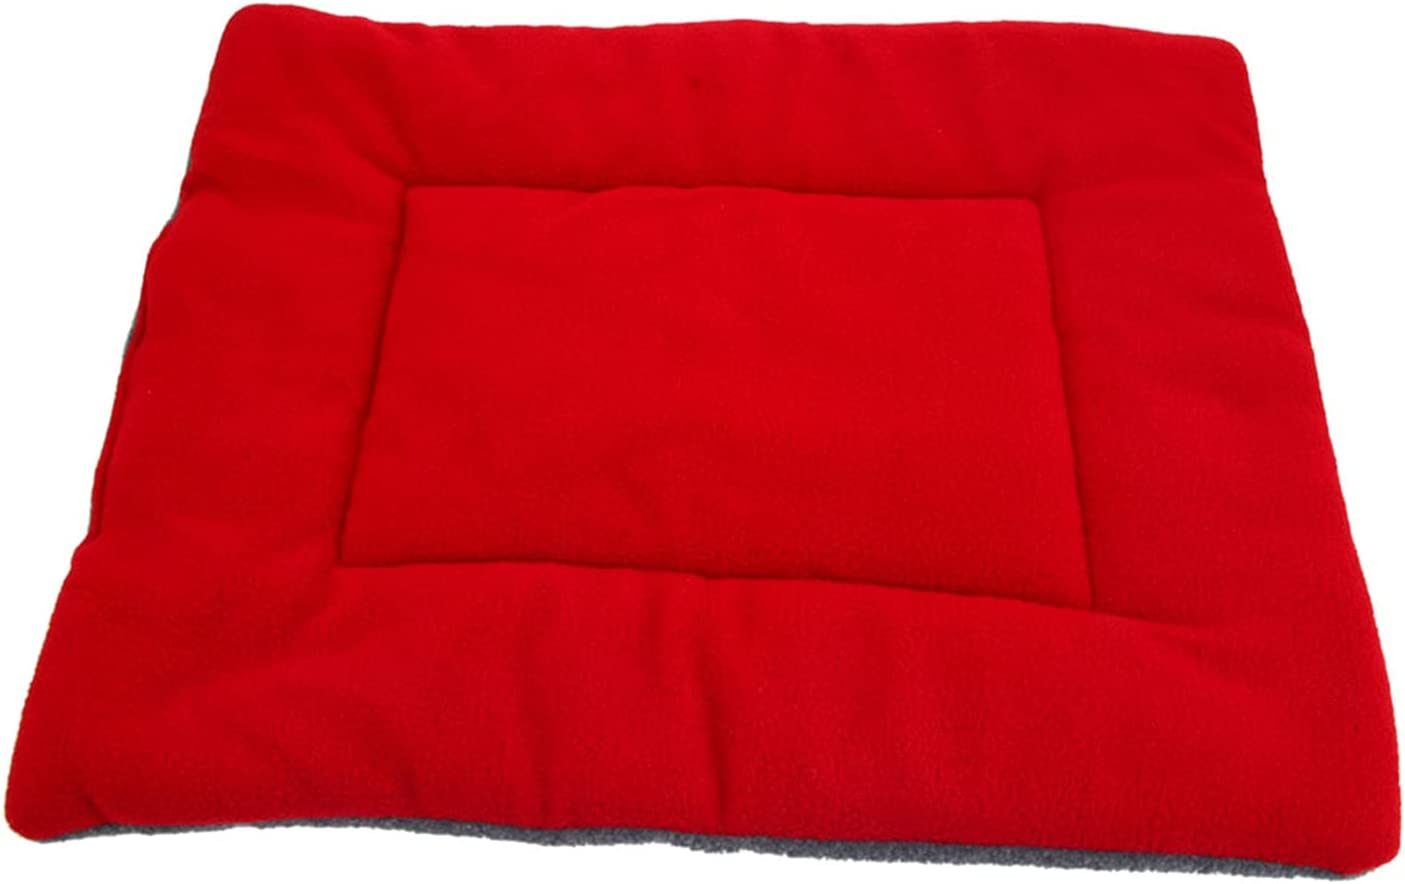 vorya Manufacturer OFFicial shop Pet Cushion; Soft Washable Max 63% OFF Silk Cotton Wadding Dog Bed Cat